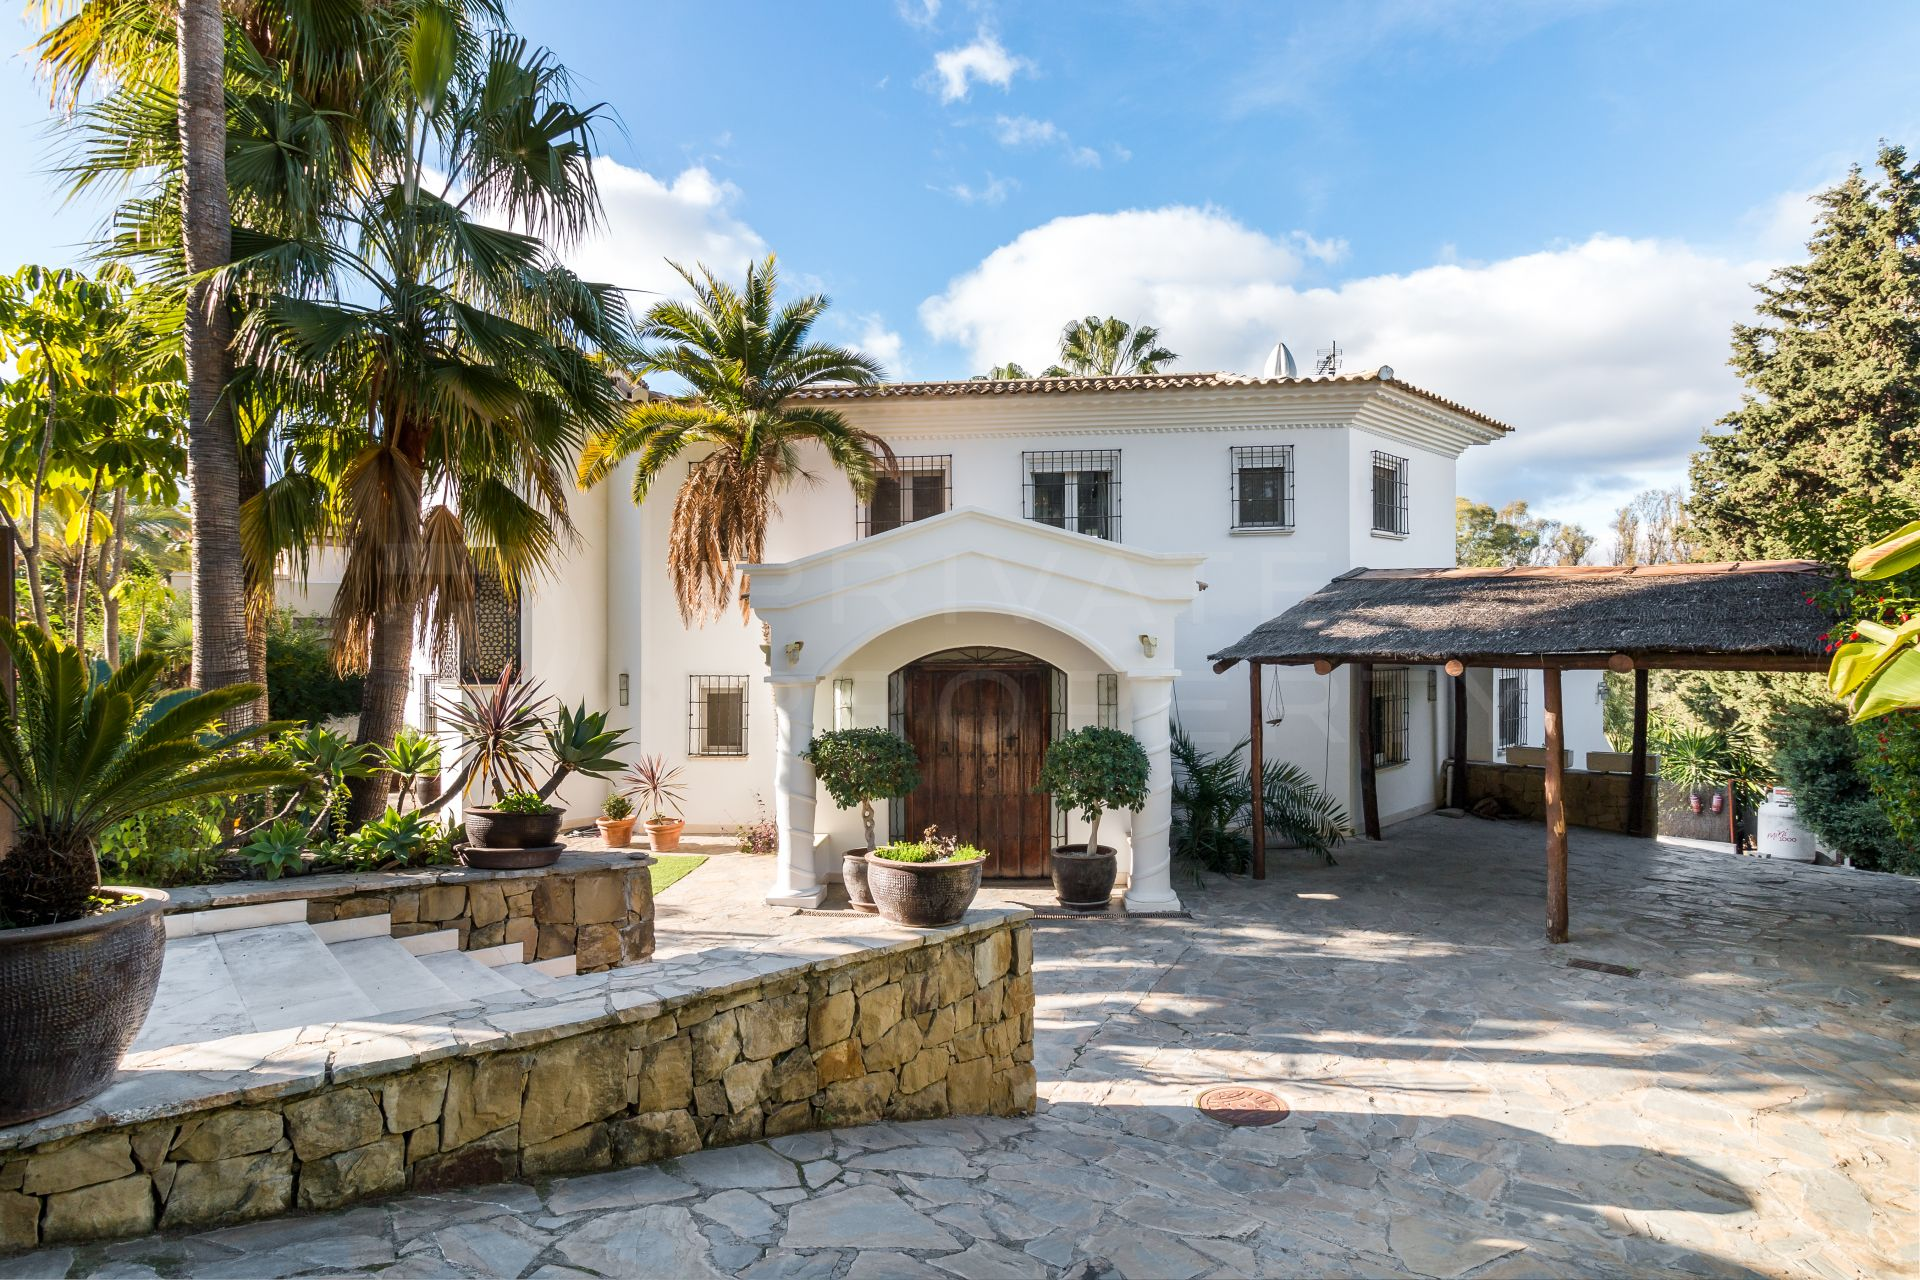 Wonderful villa on the golf course in El Paraiso